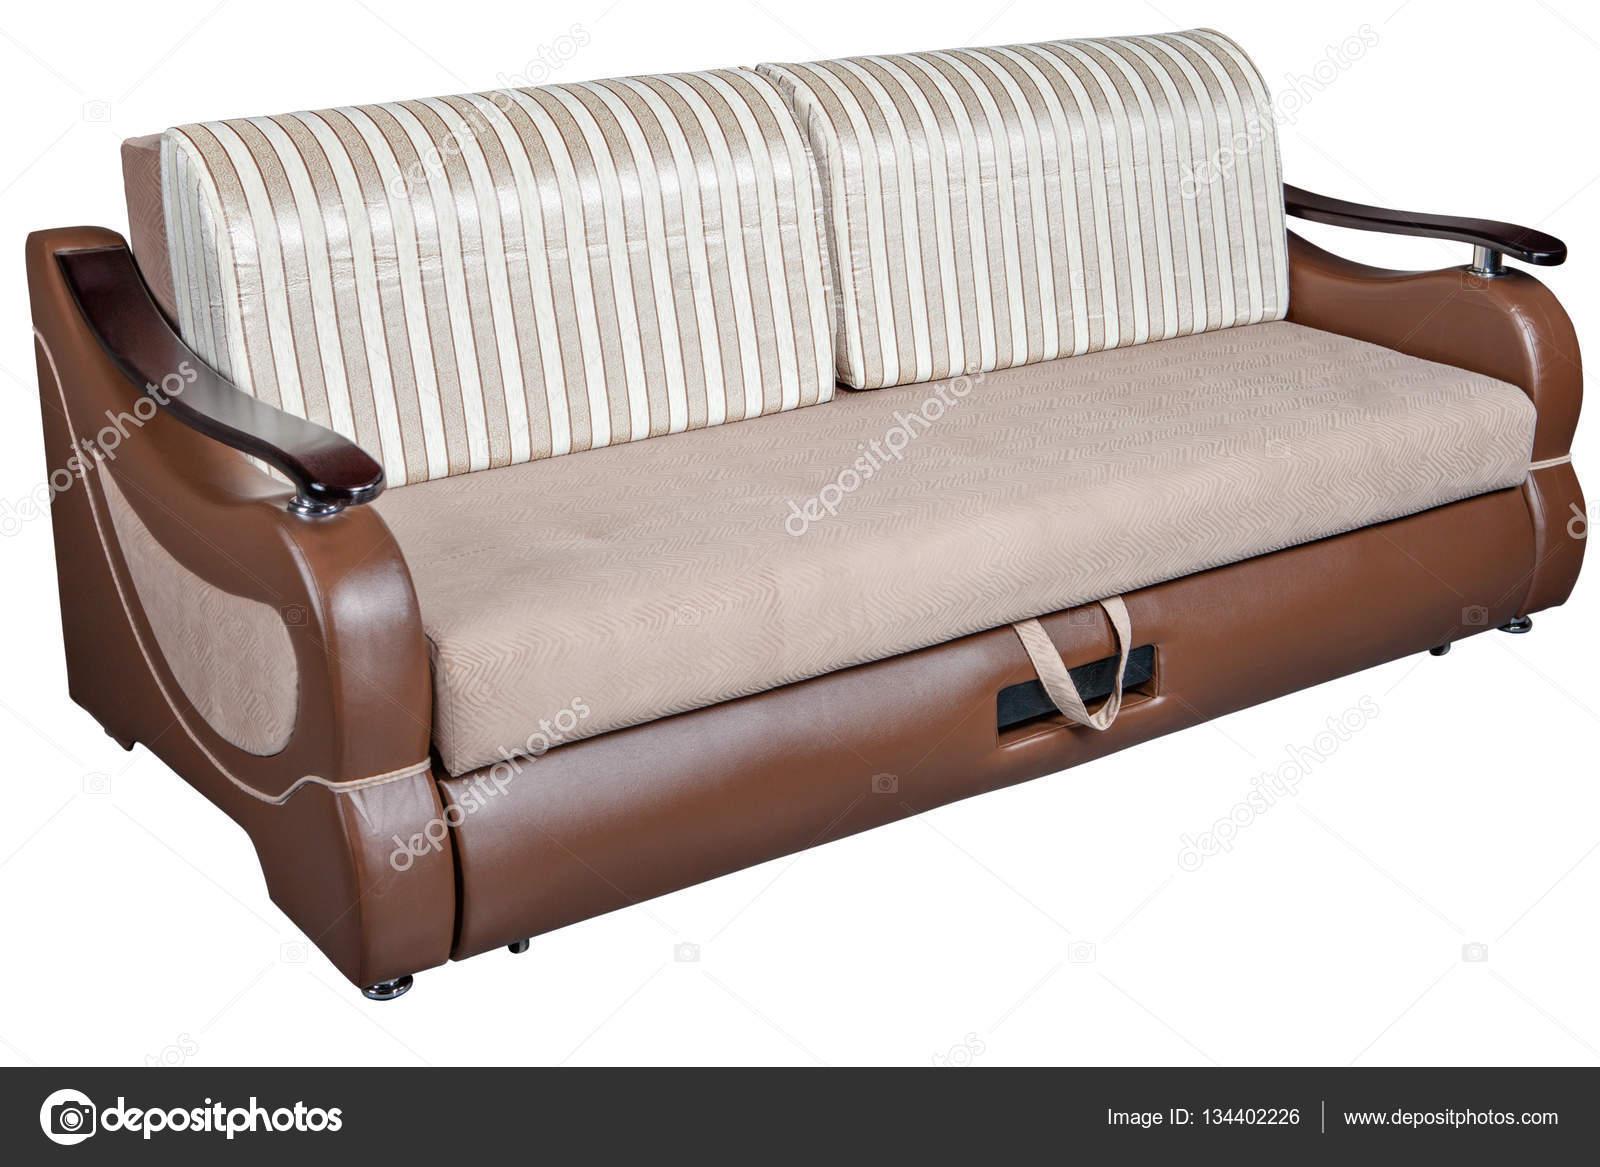 Großartig Sofa Möbel Galerie Von Transformator Bett Kombination Möbel — Stockfoto